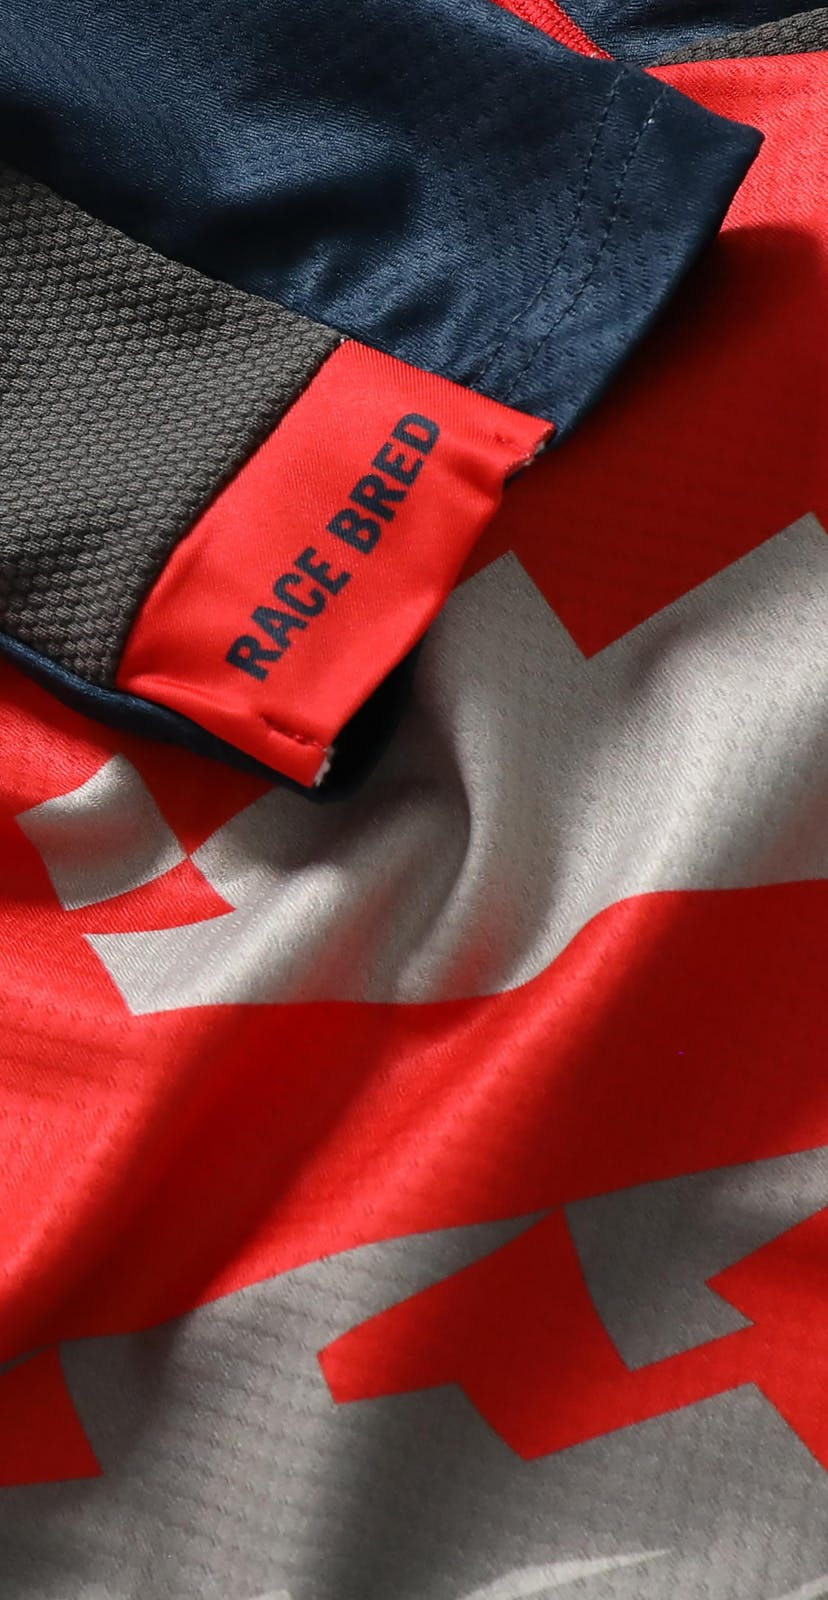 2020 W'S Enduro Jersey Detail 1